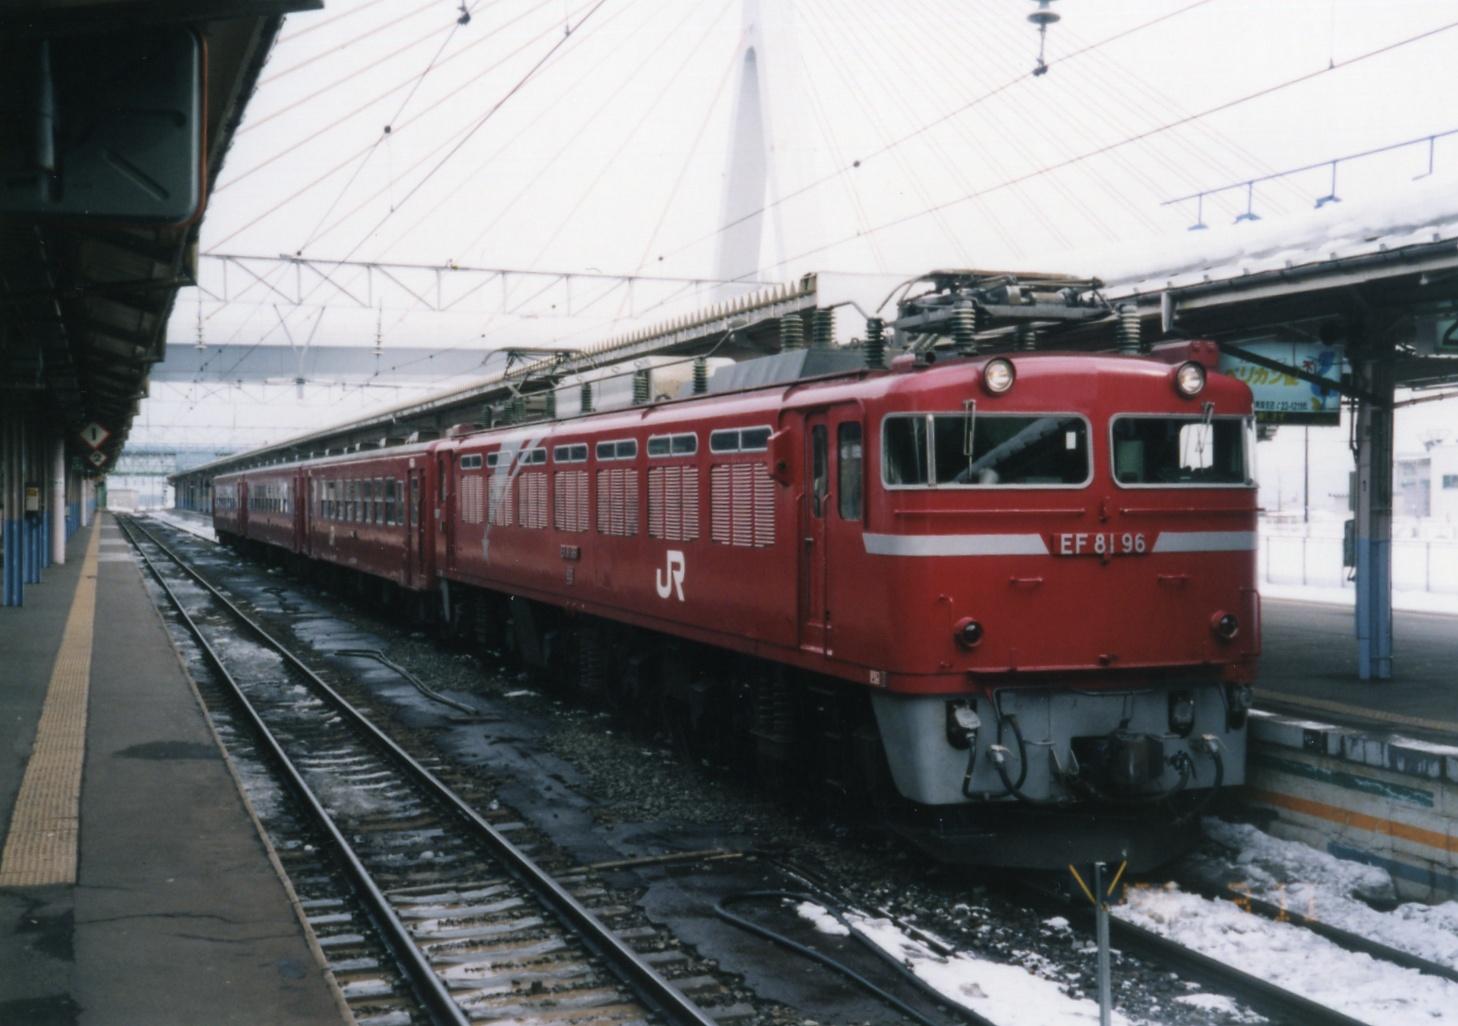 https://upload.wikimedia.org/wikipedia/commons/b/b2/A_local_train_from_Aomori_to_Morioka.jpg